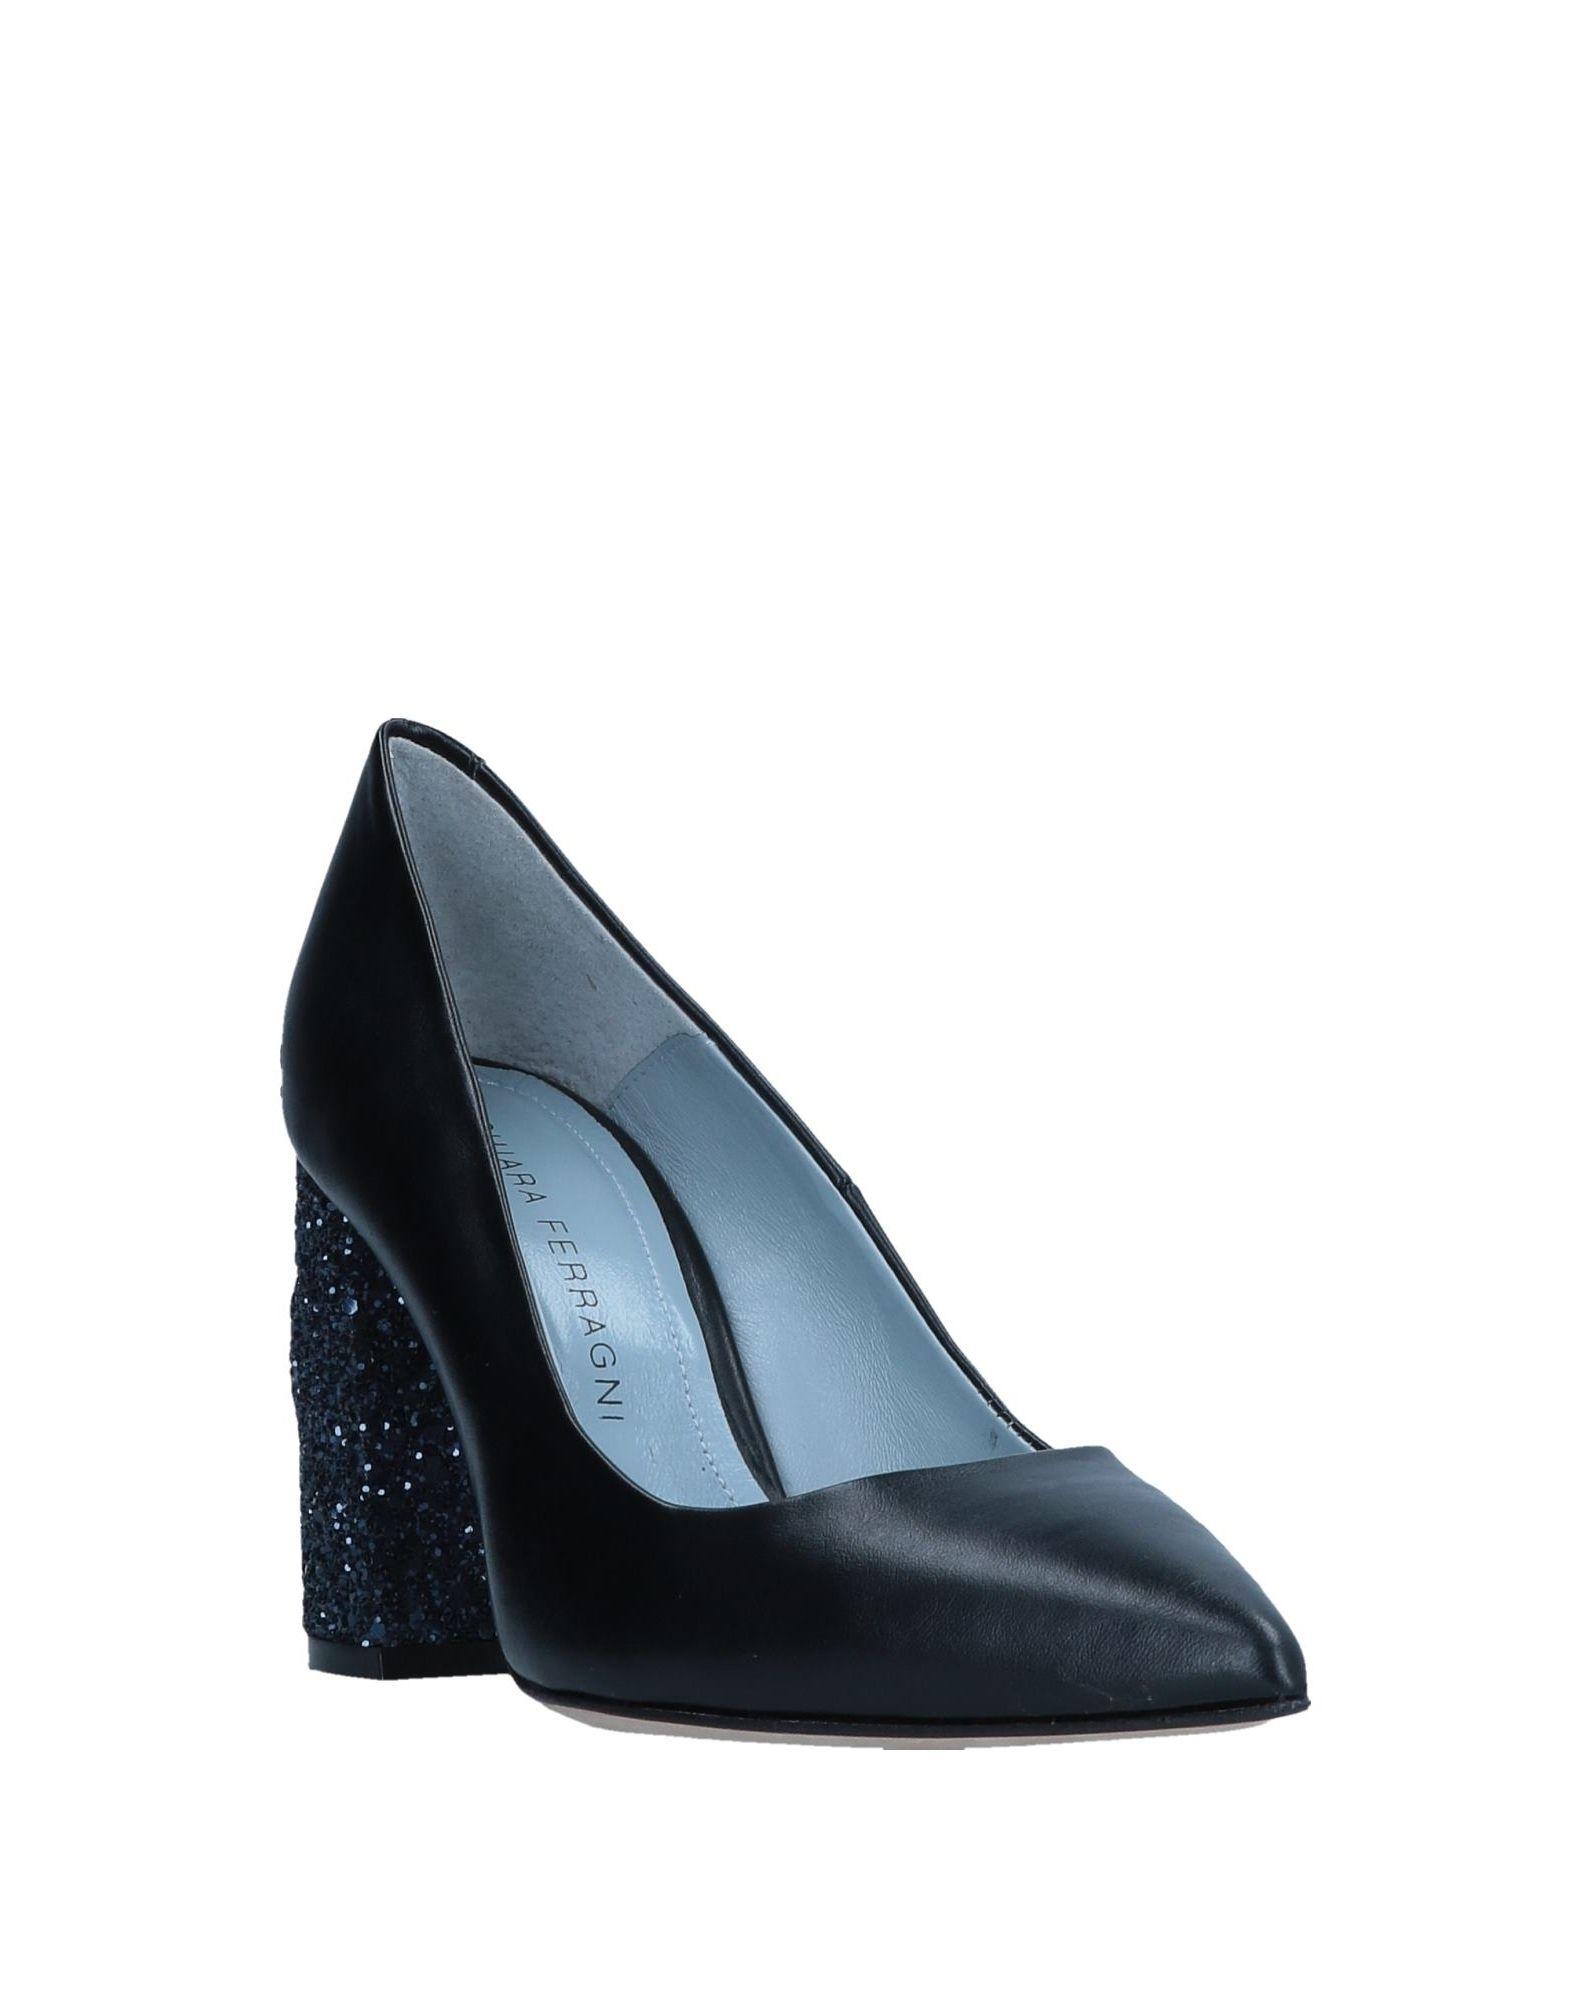 Chiara Ferragni Pumps Damen strapazierfähige  11549543TOGut aussehende strapazierfähige Damen Schuhe 65a31f